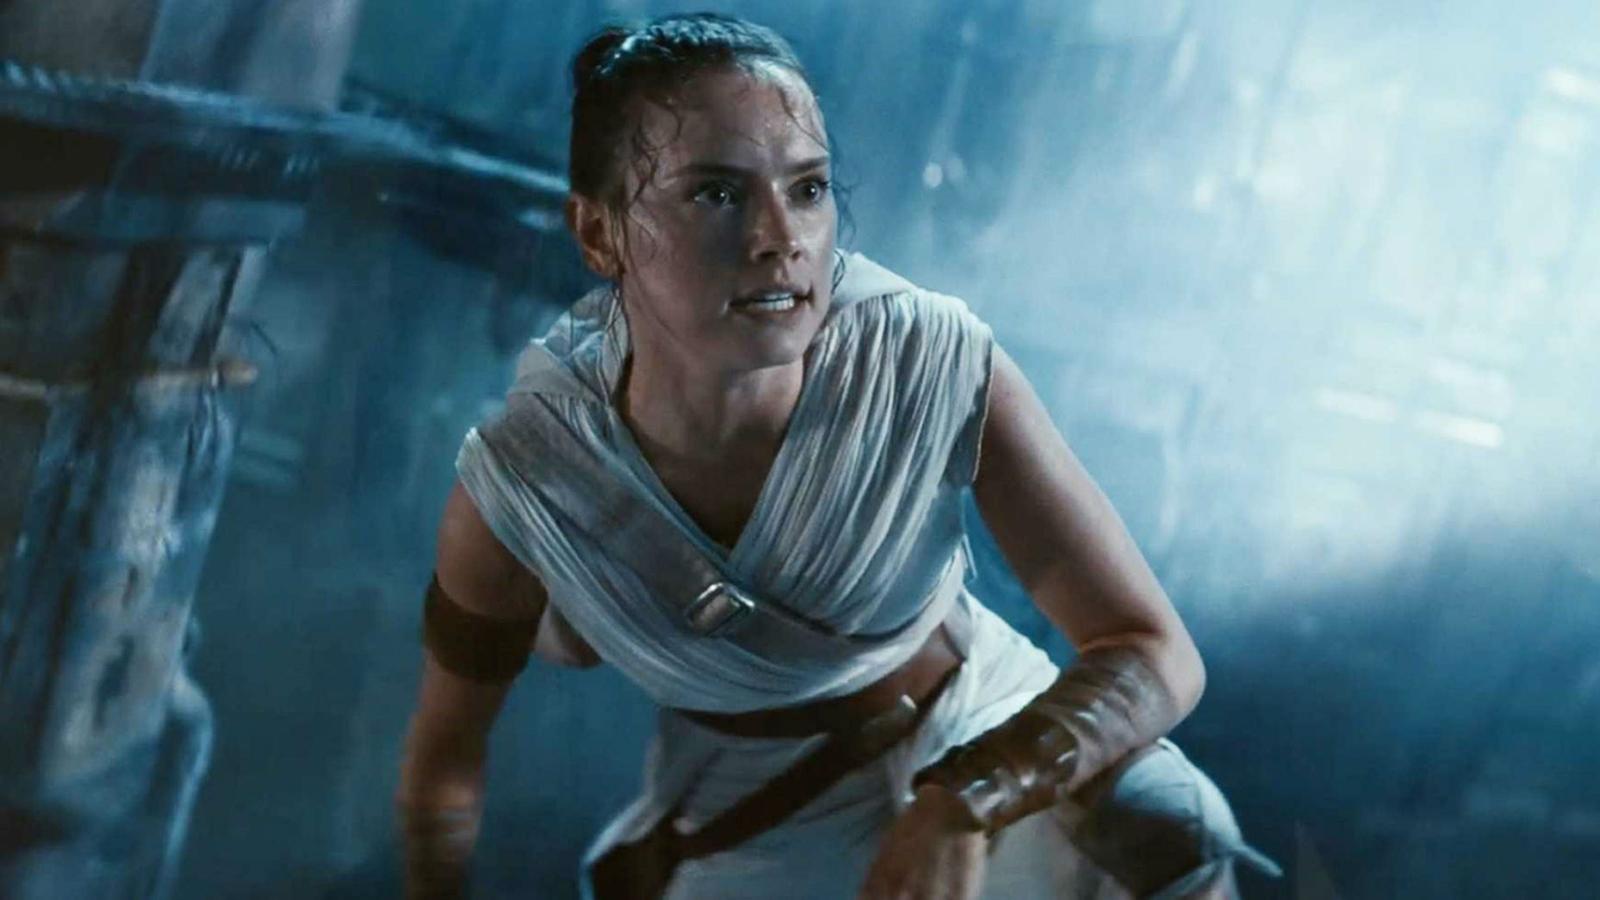 Rey in Star Wars Rise of Skywalker